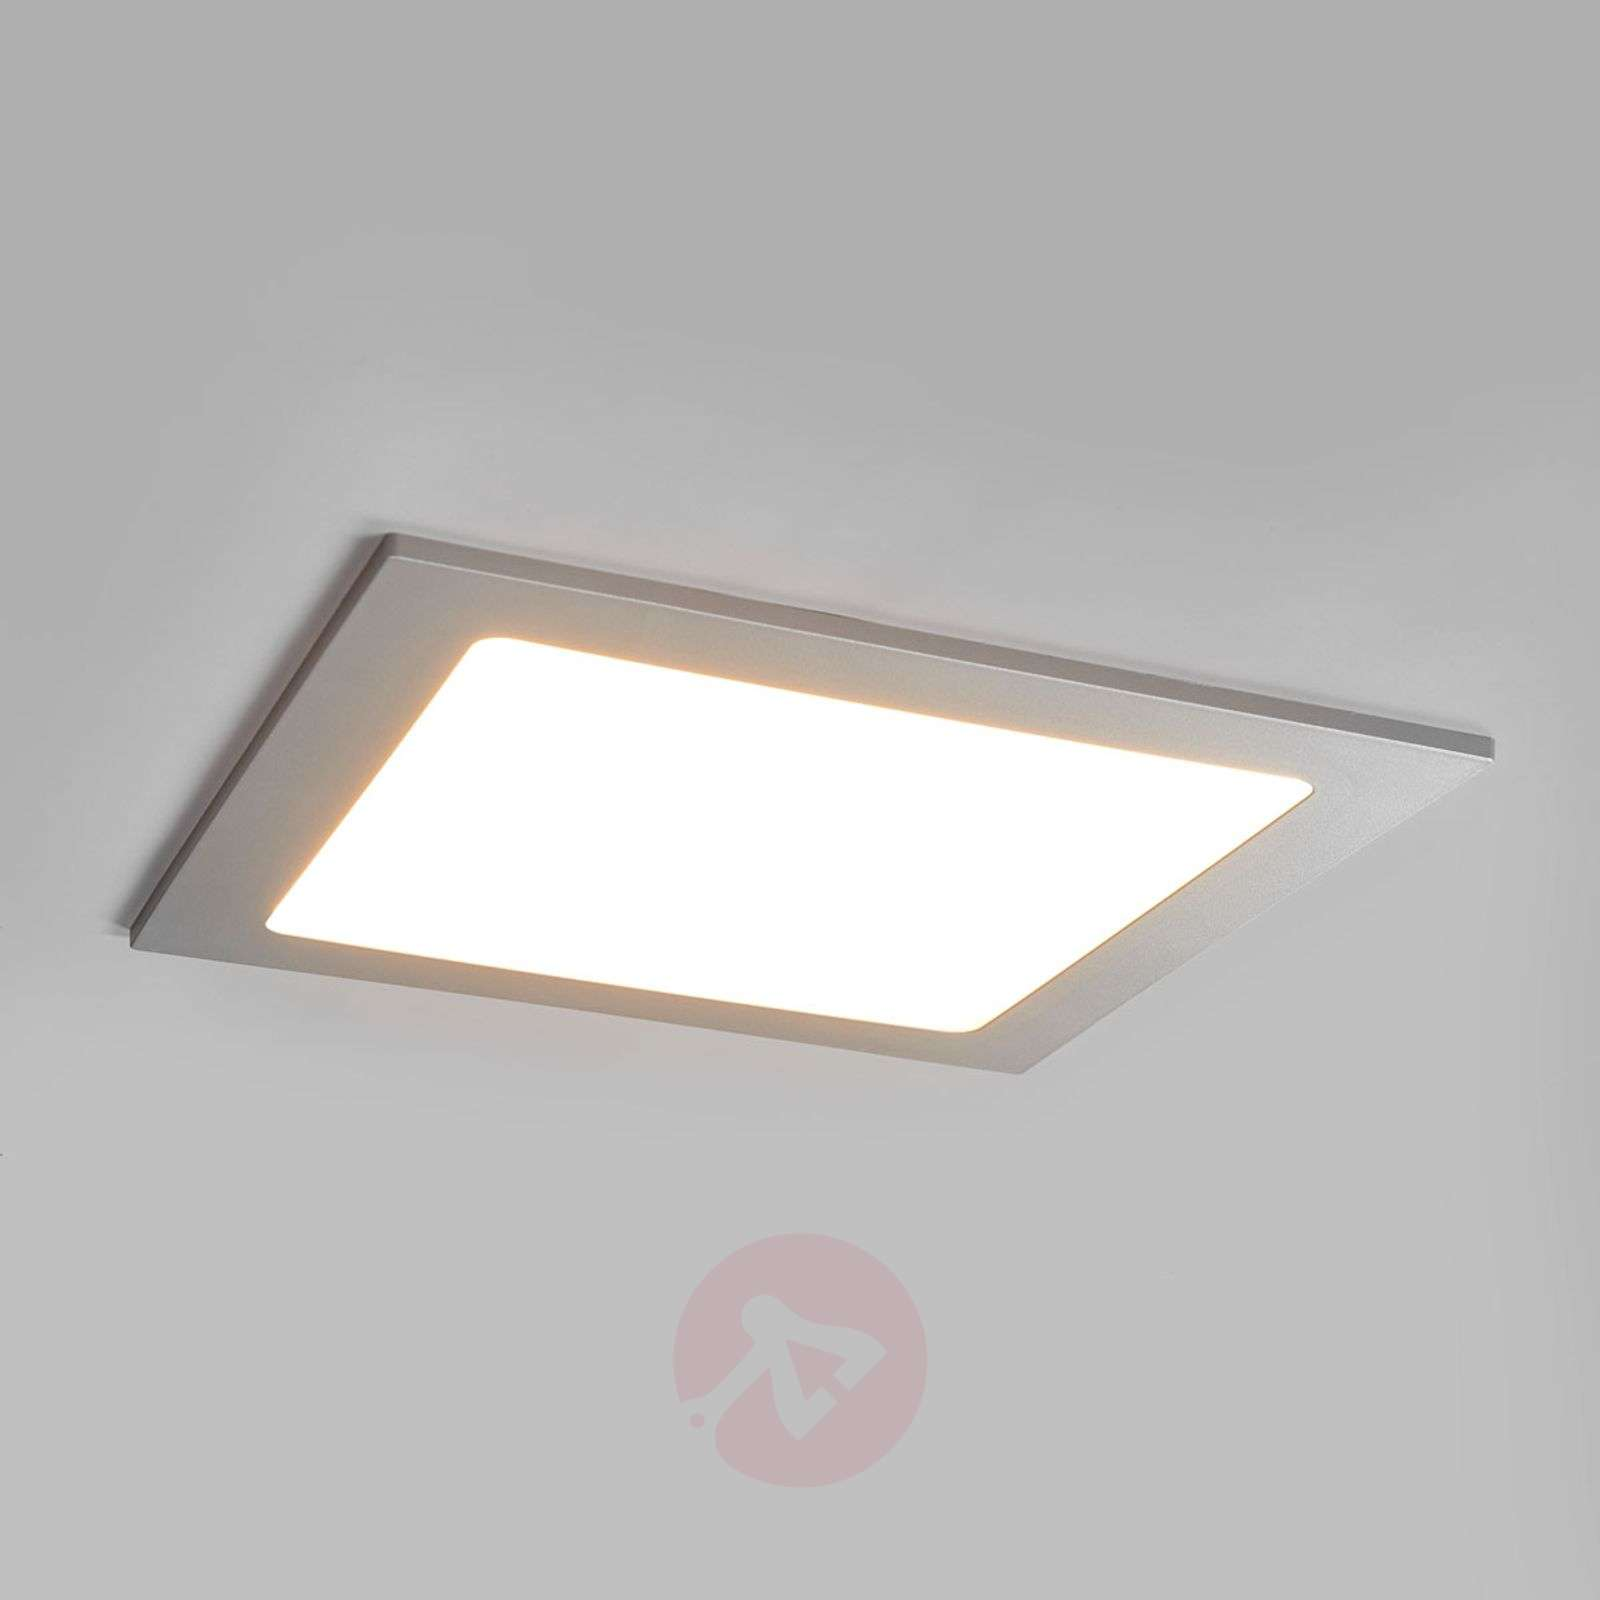 Hopeanvärinen Joki-LED-alasvalo, IP44-9978050-02